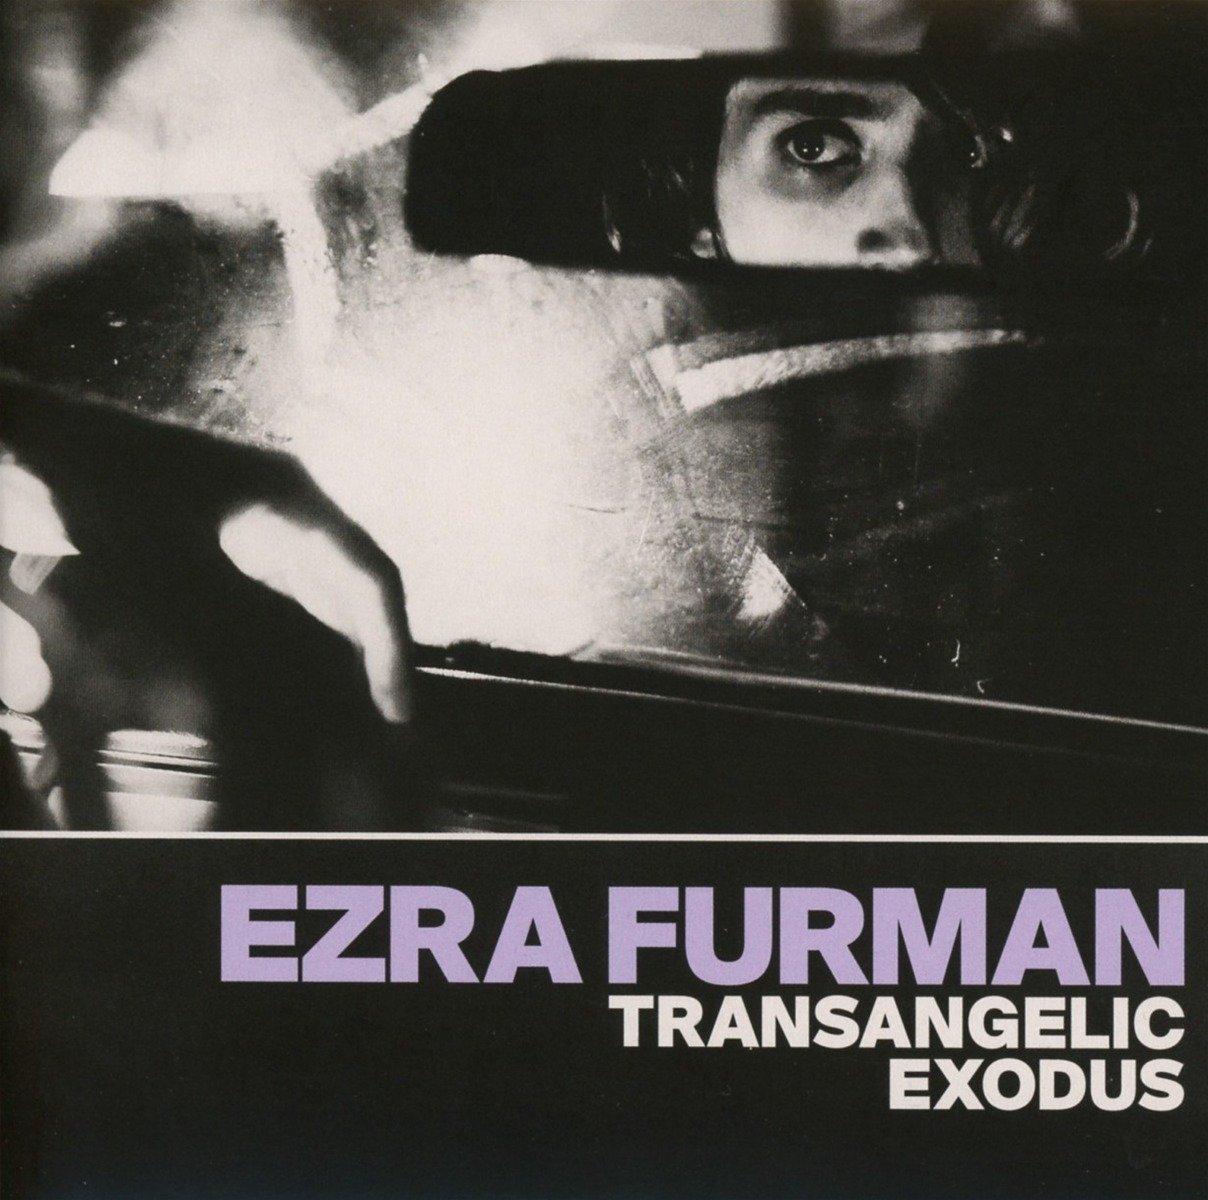 Ezra Furman, Transangelic Exodus | Album Review